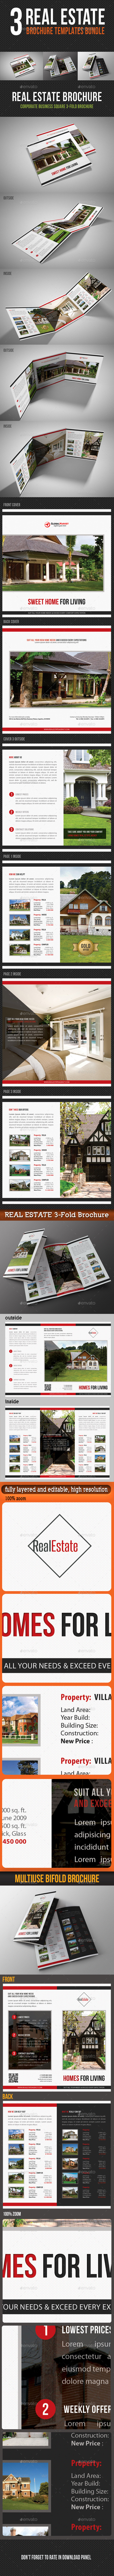 3 in 1 Real Estate Brochure Bundle - Corporate Brochures